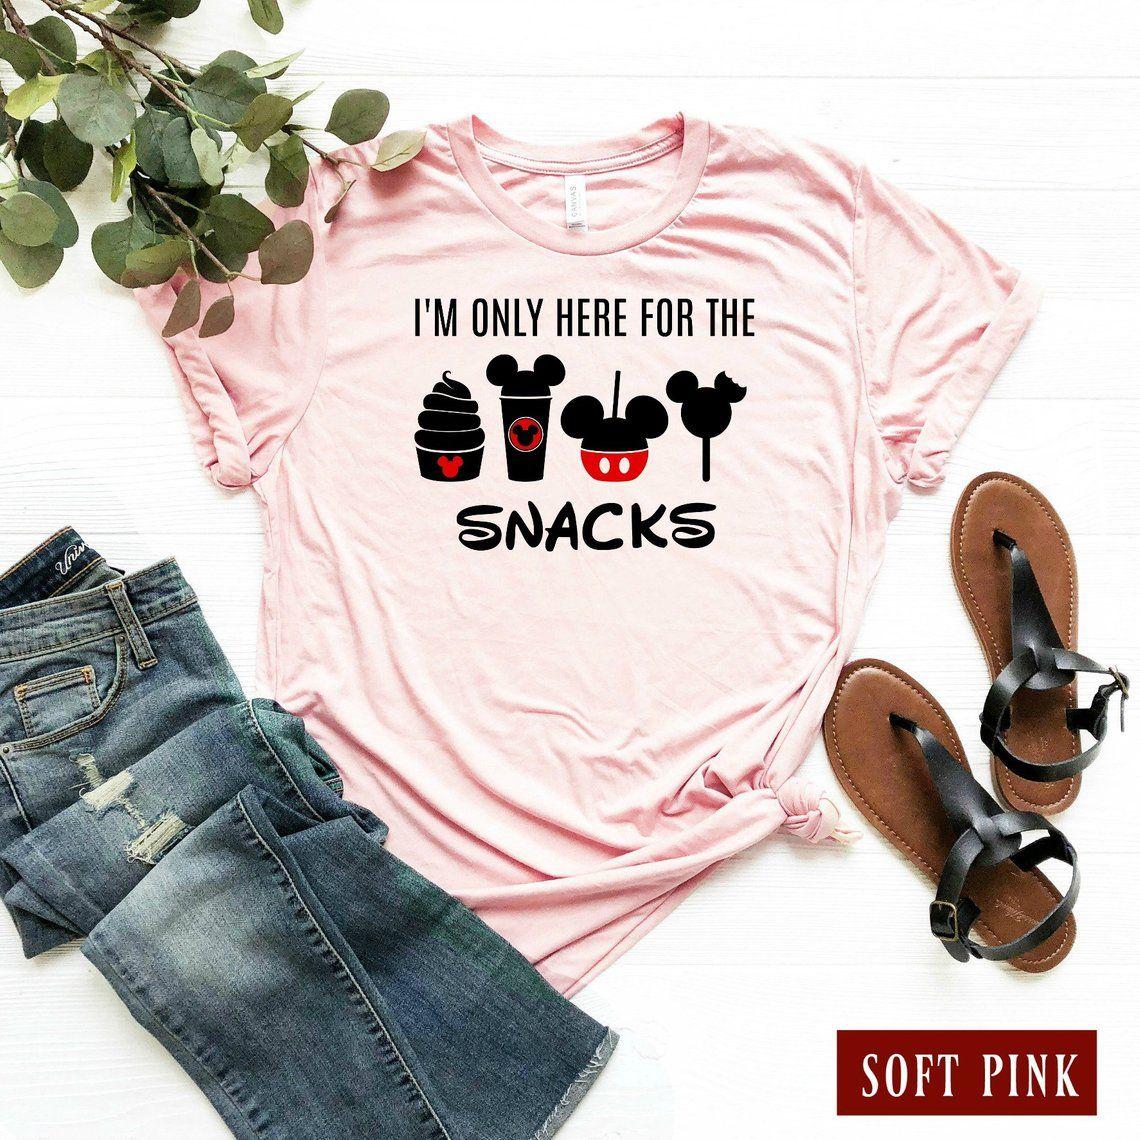 12f587dbd IM Only Here For The Snacks Disney TShirt / Snackgoals Disney | Etsy ...